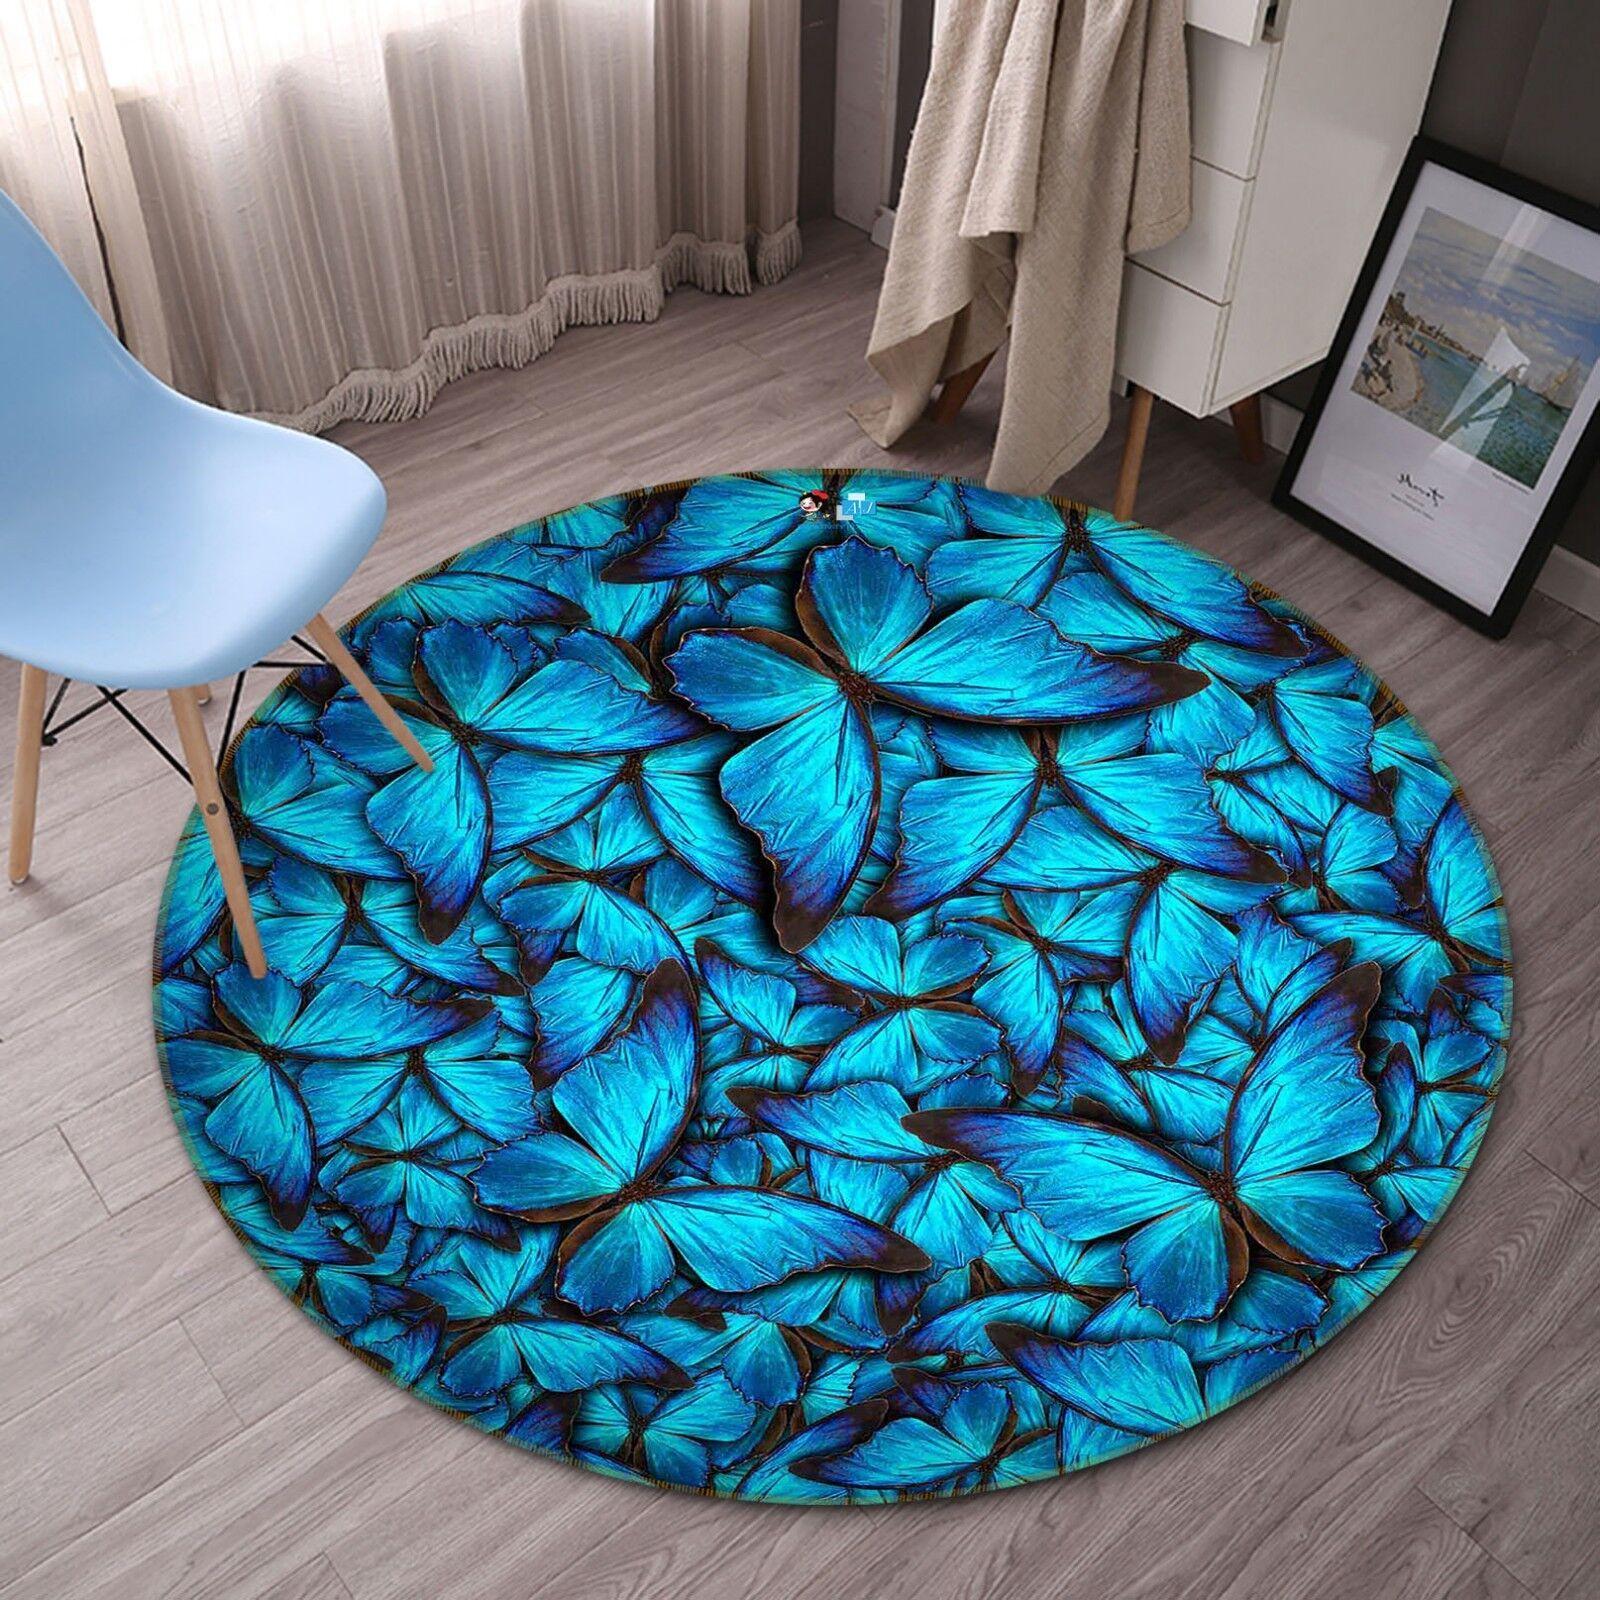 3d mariposa 5 antideslizante alfombra de maletero rondas elegante alfombra de